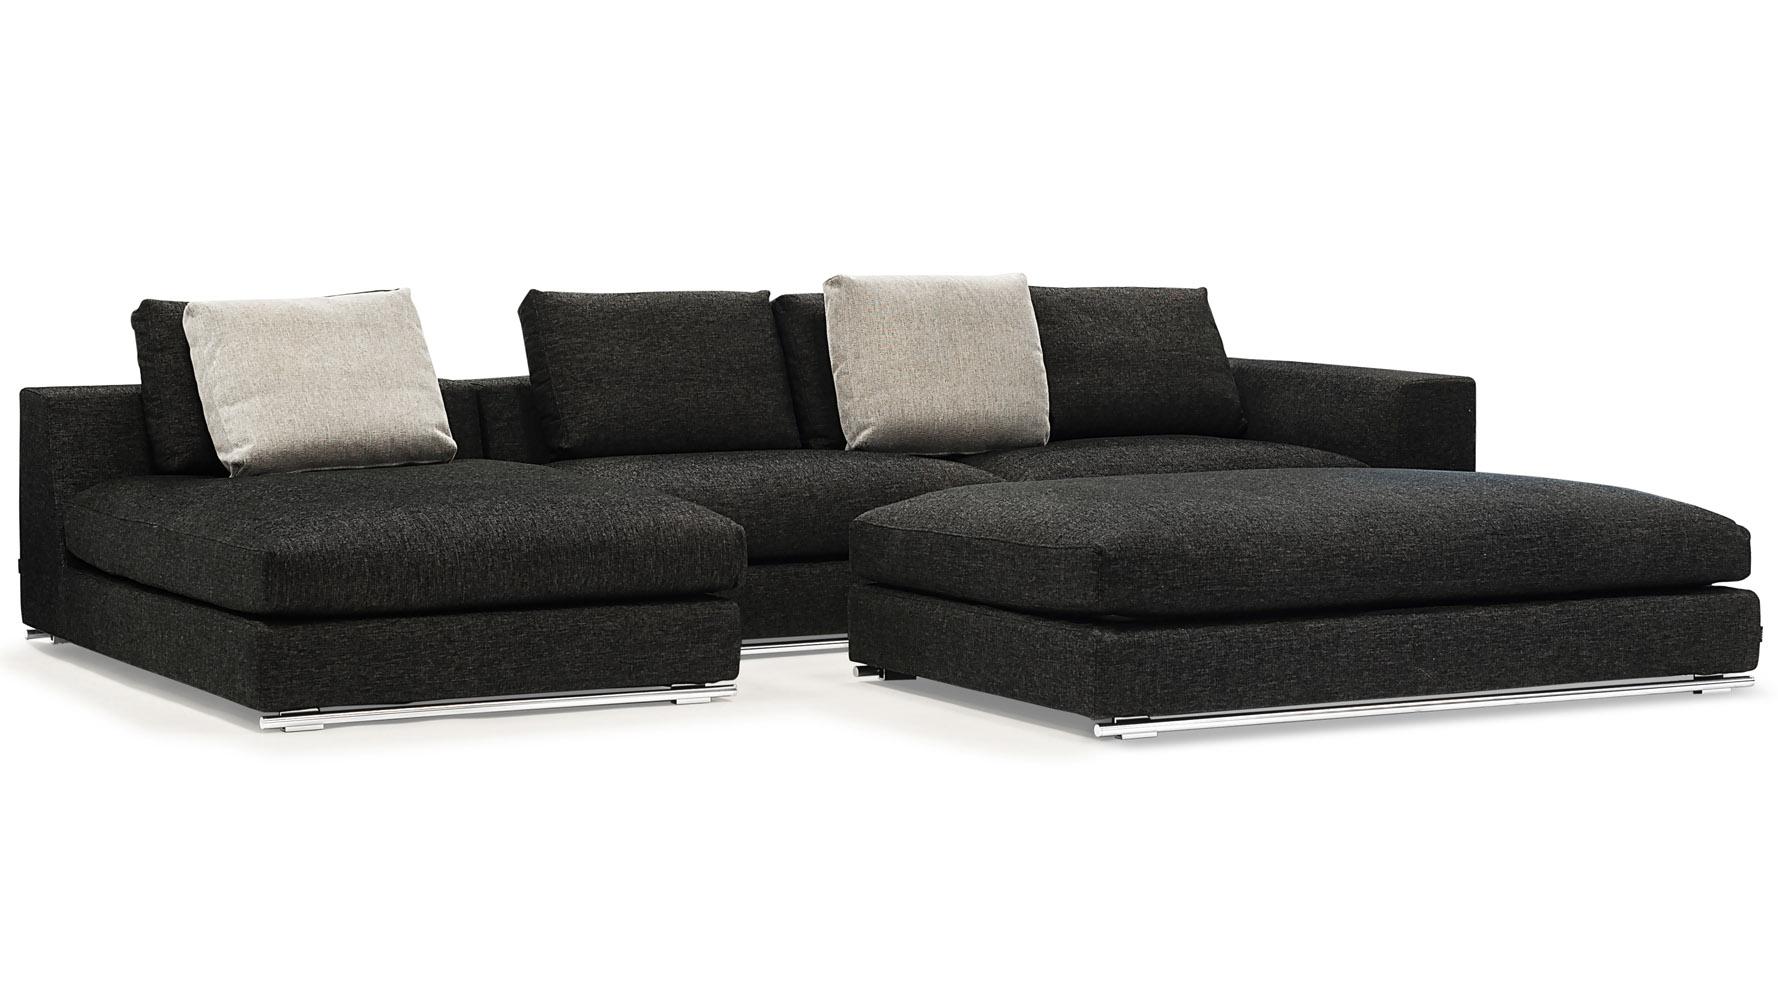 Black Fabric Sectional Sofa Divani Casa Arden Modern Black  : comodo sectional sofa left chaise with ottoman black2 from thesofa.droogkast.com size 1778 x 1000 jpeg 240kB